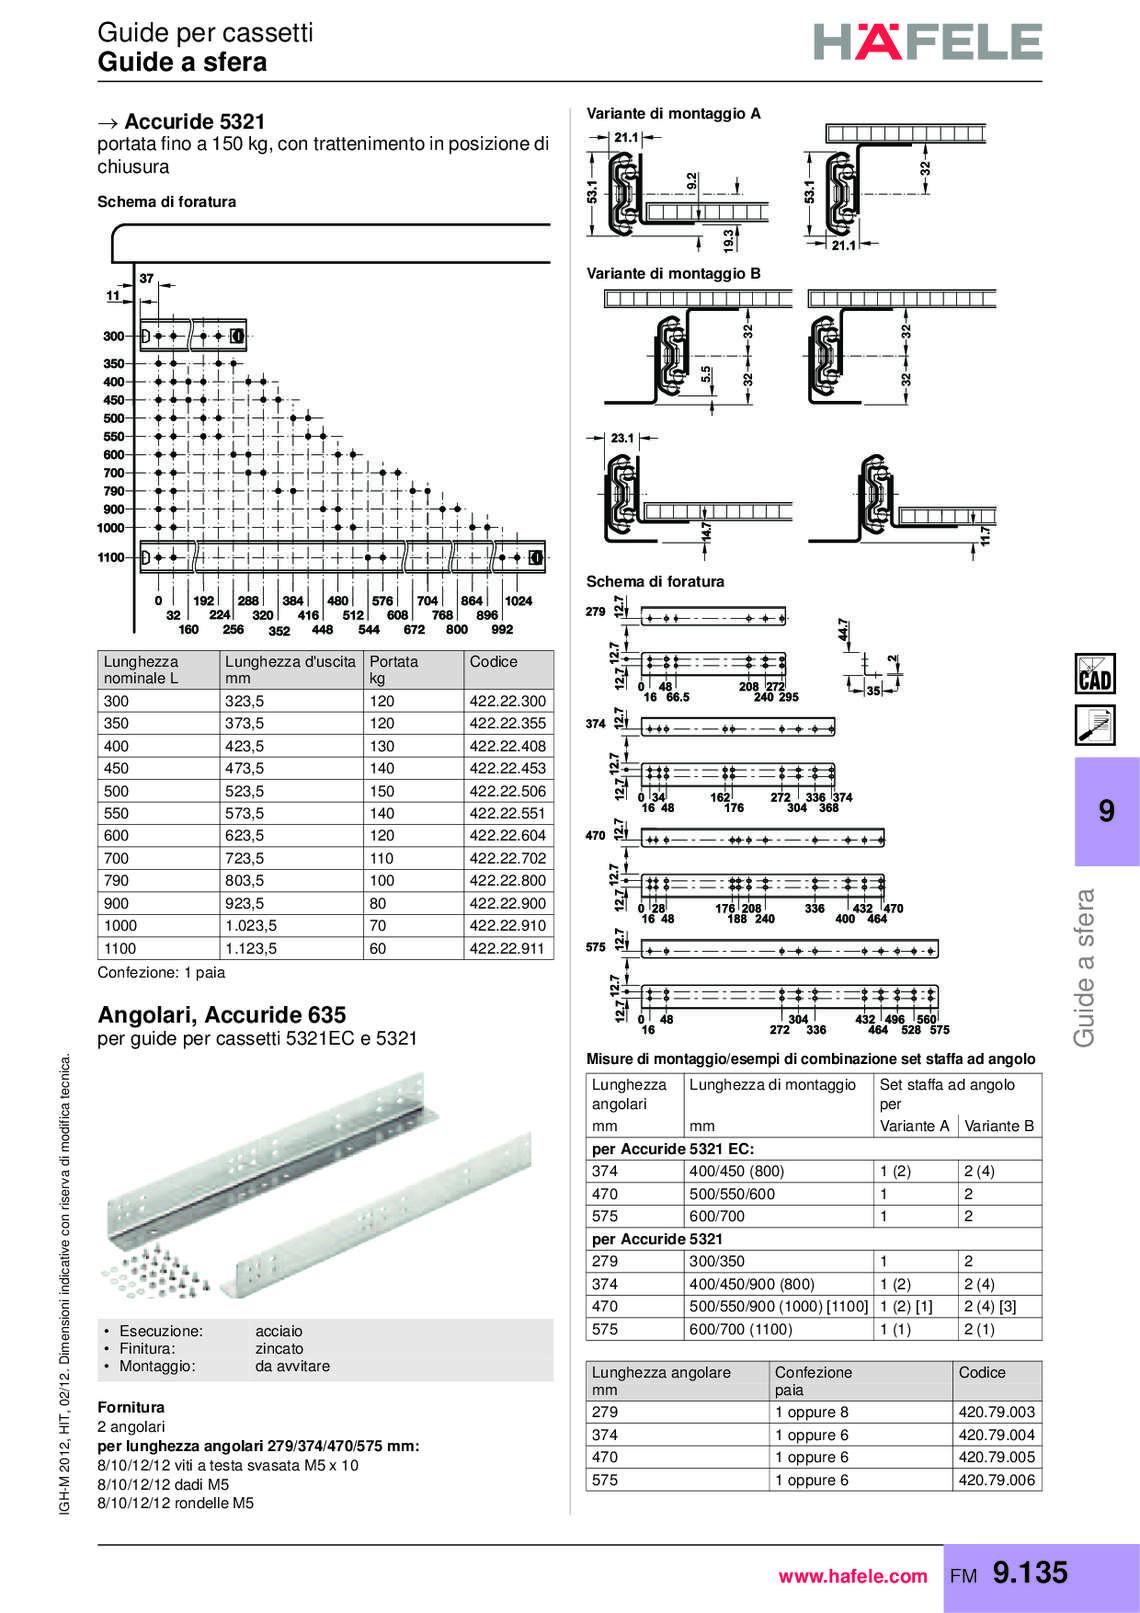 hafele-spondine-e-guide-per-mobili_40_192.jpg